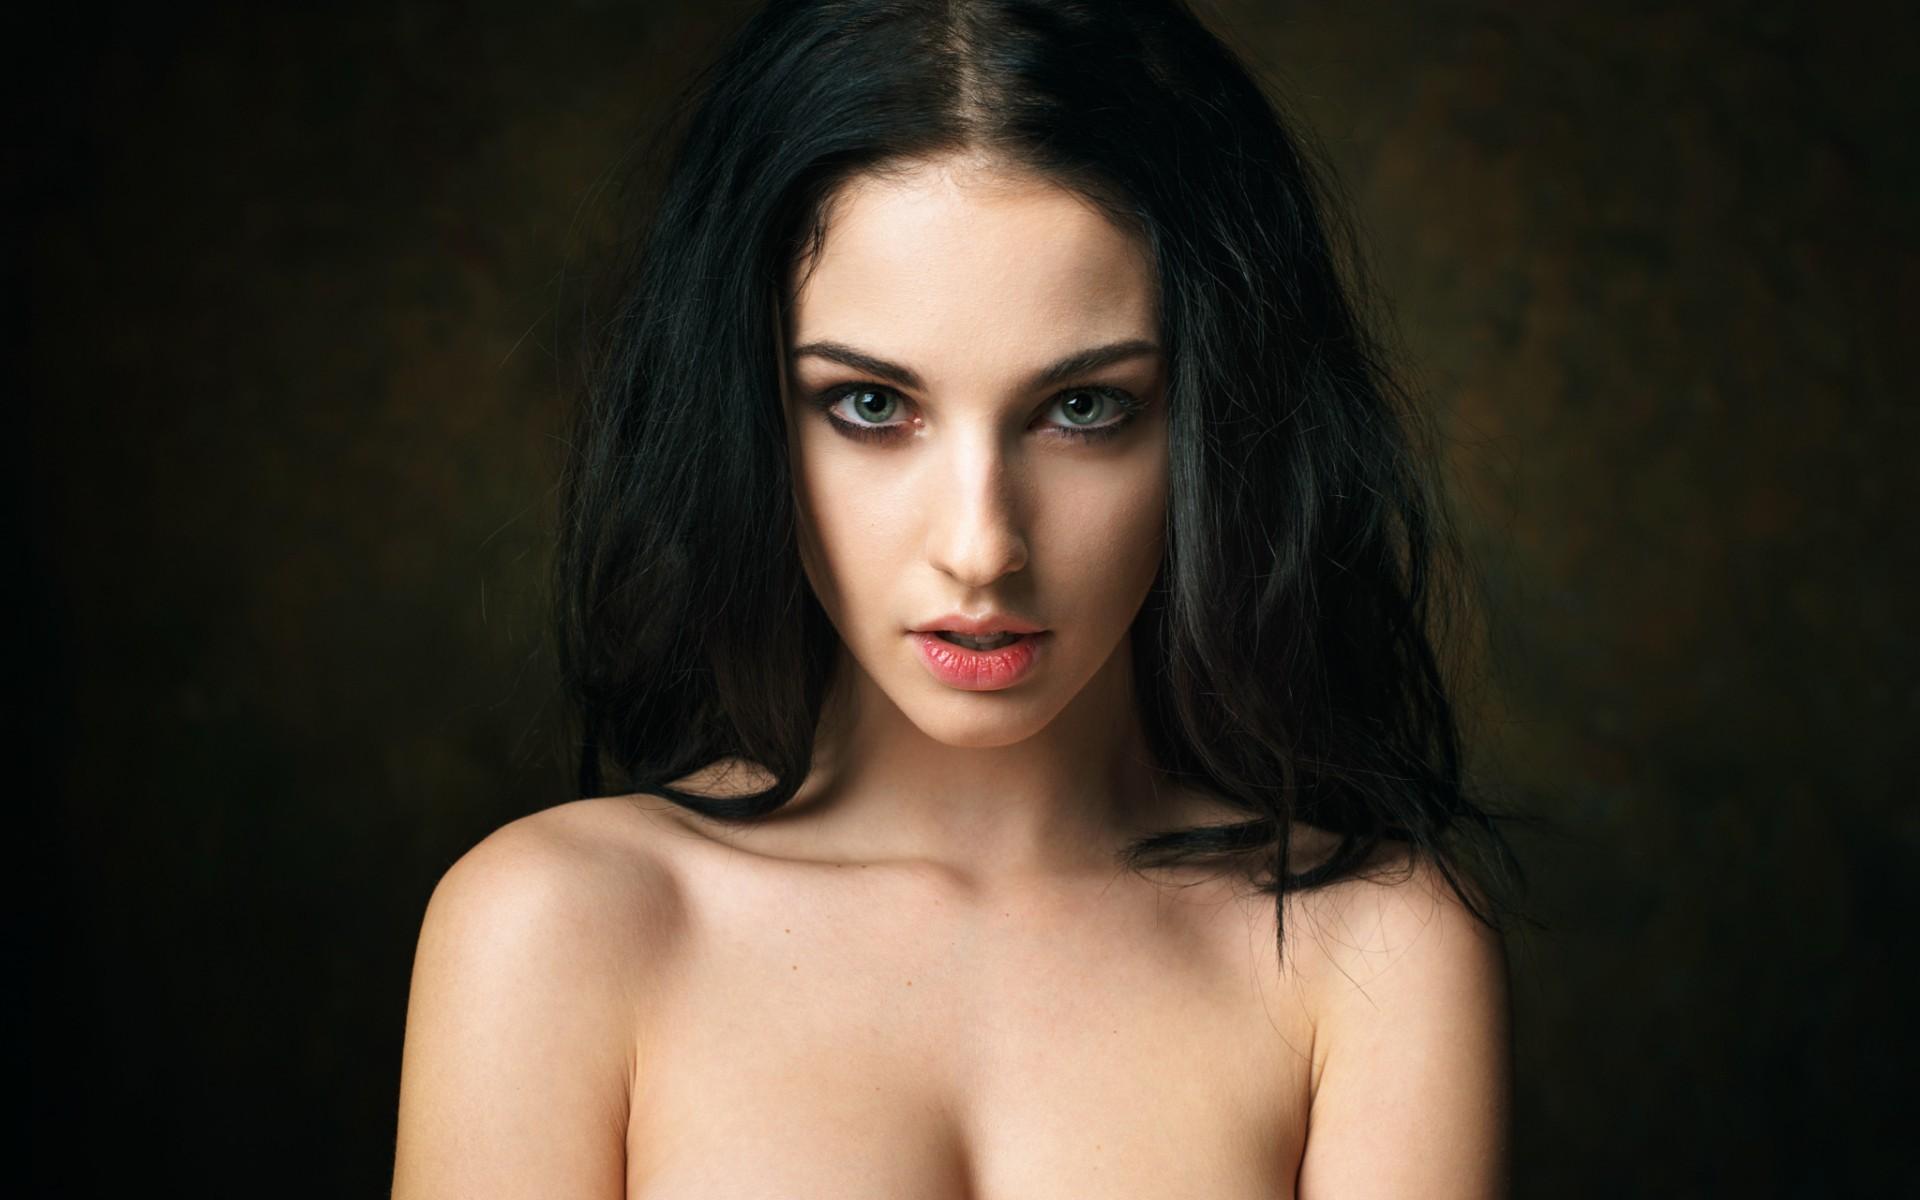 Полина короткова порно